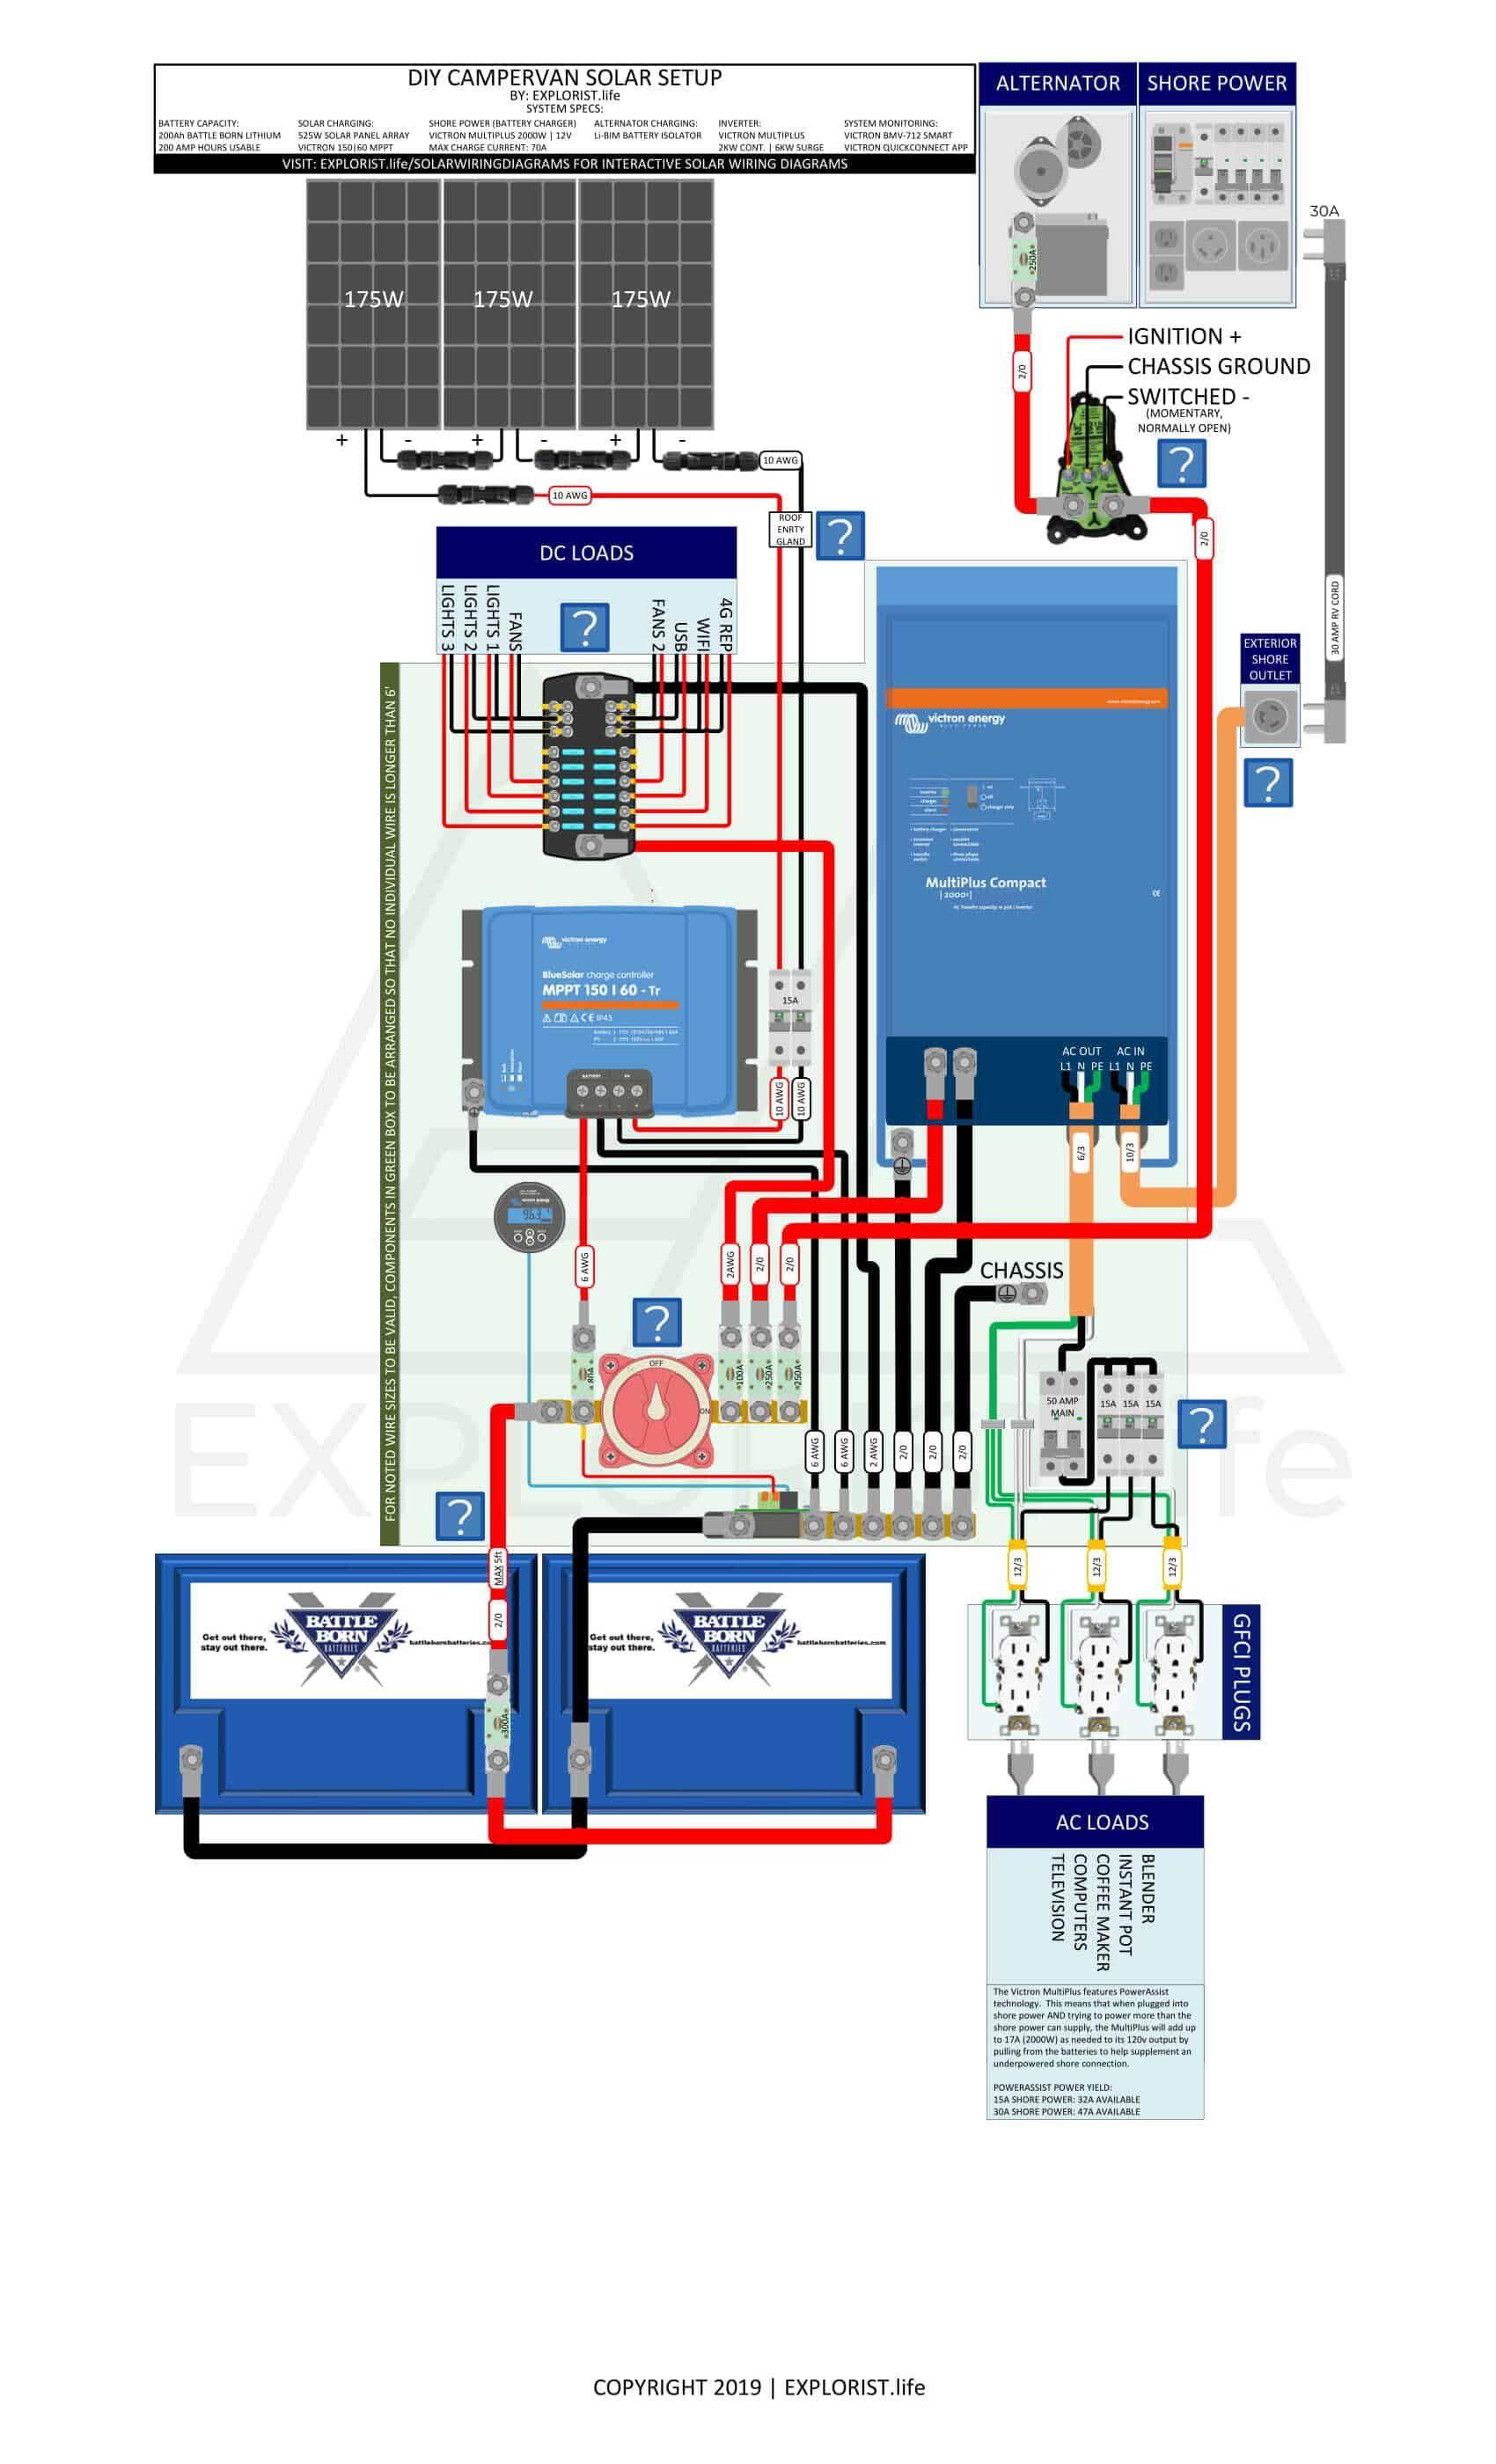 Interactive Diy Solar Wiring Diagrams For Campers Van S Rv S Diy Solar Solar Power Diy Solar Panels